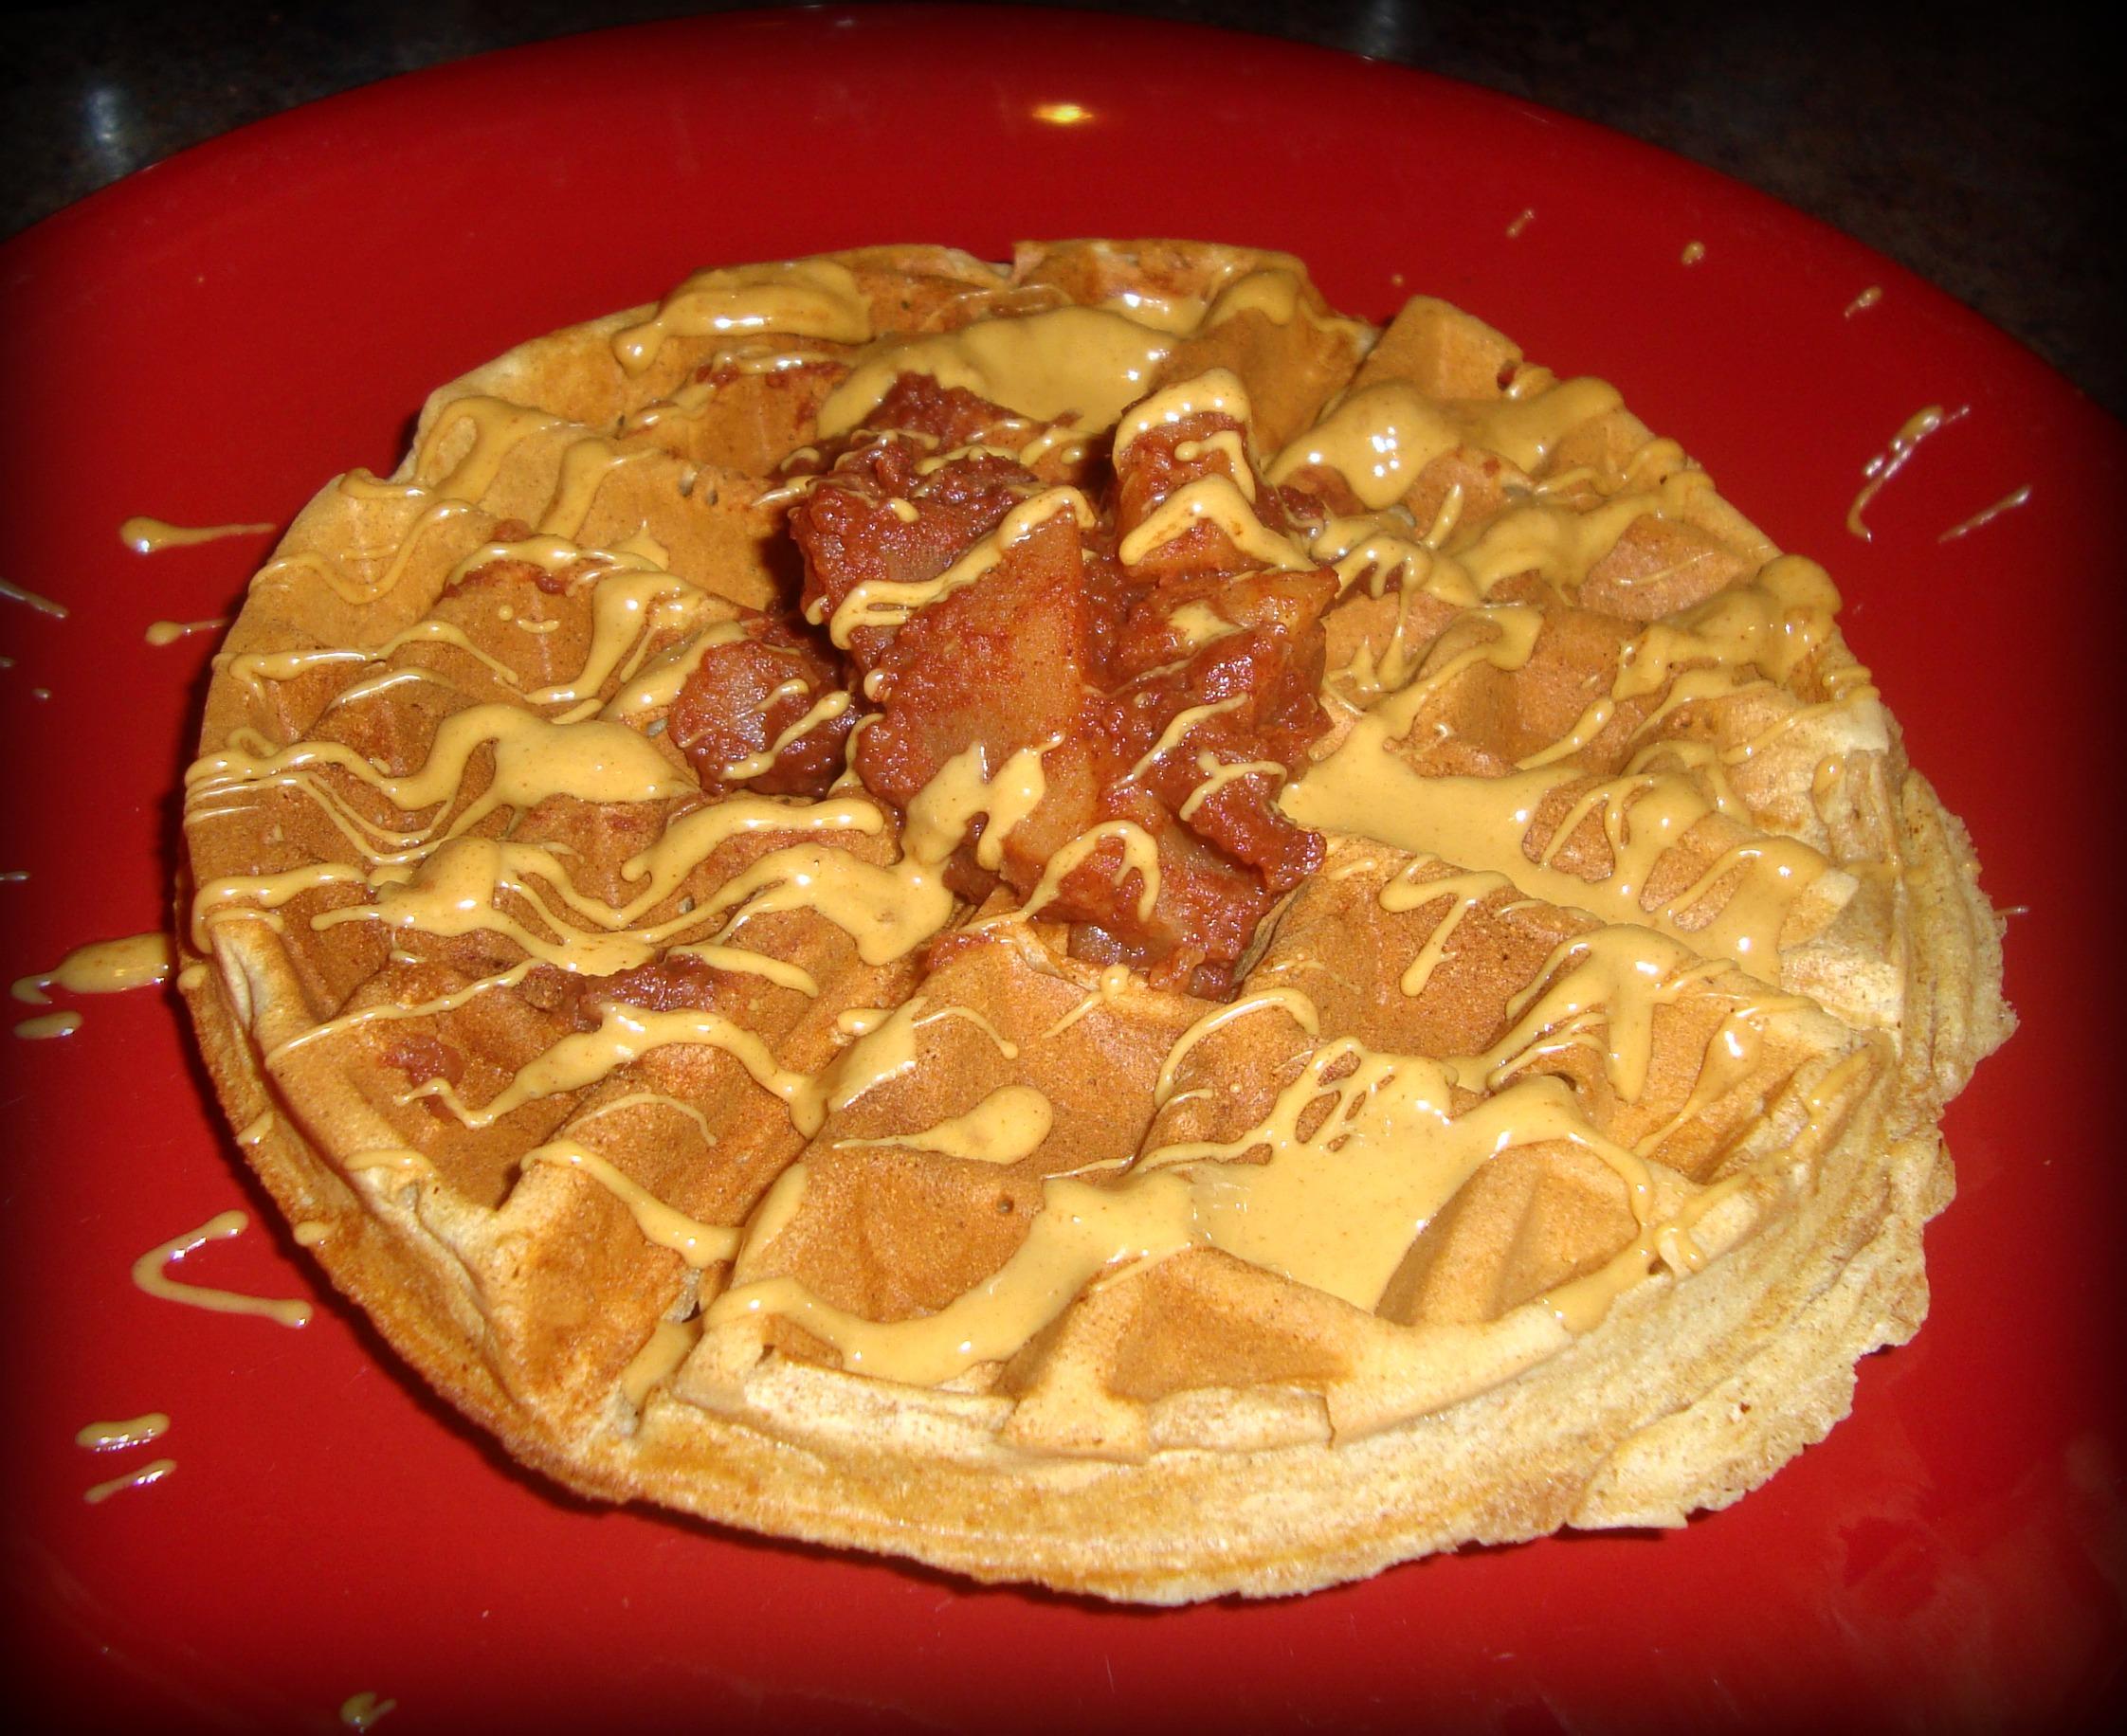 Tasty Tuesday: Whole Wheat Peanut Butter Waffles